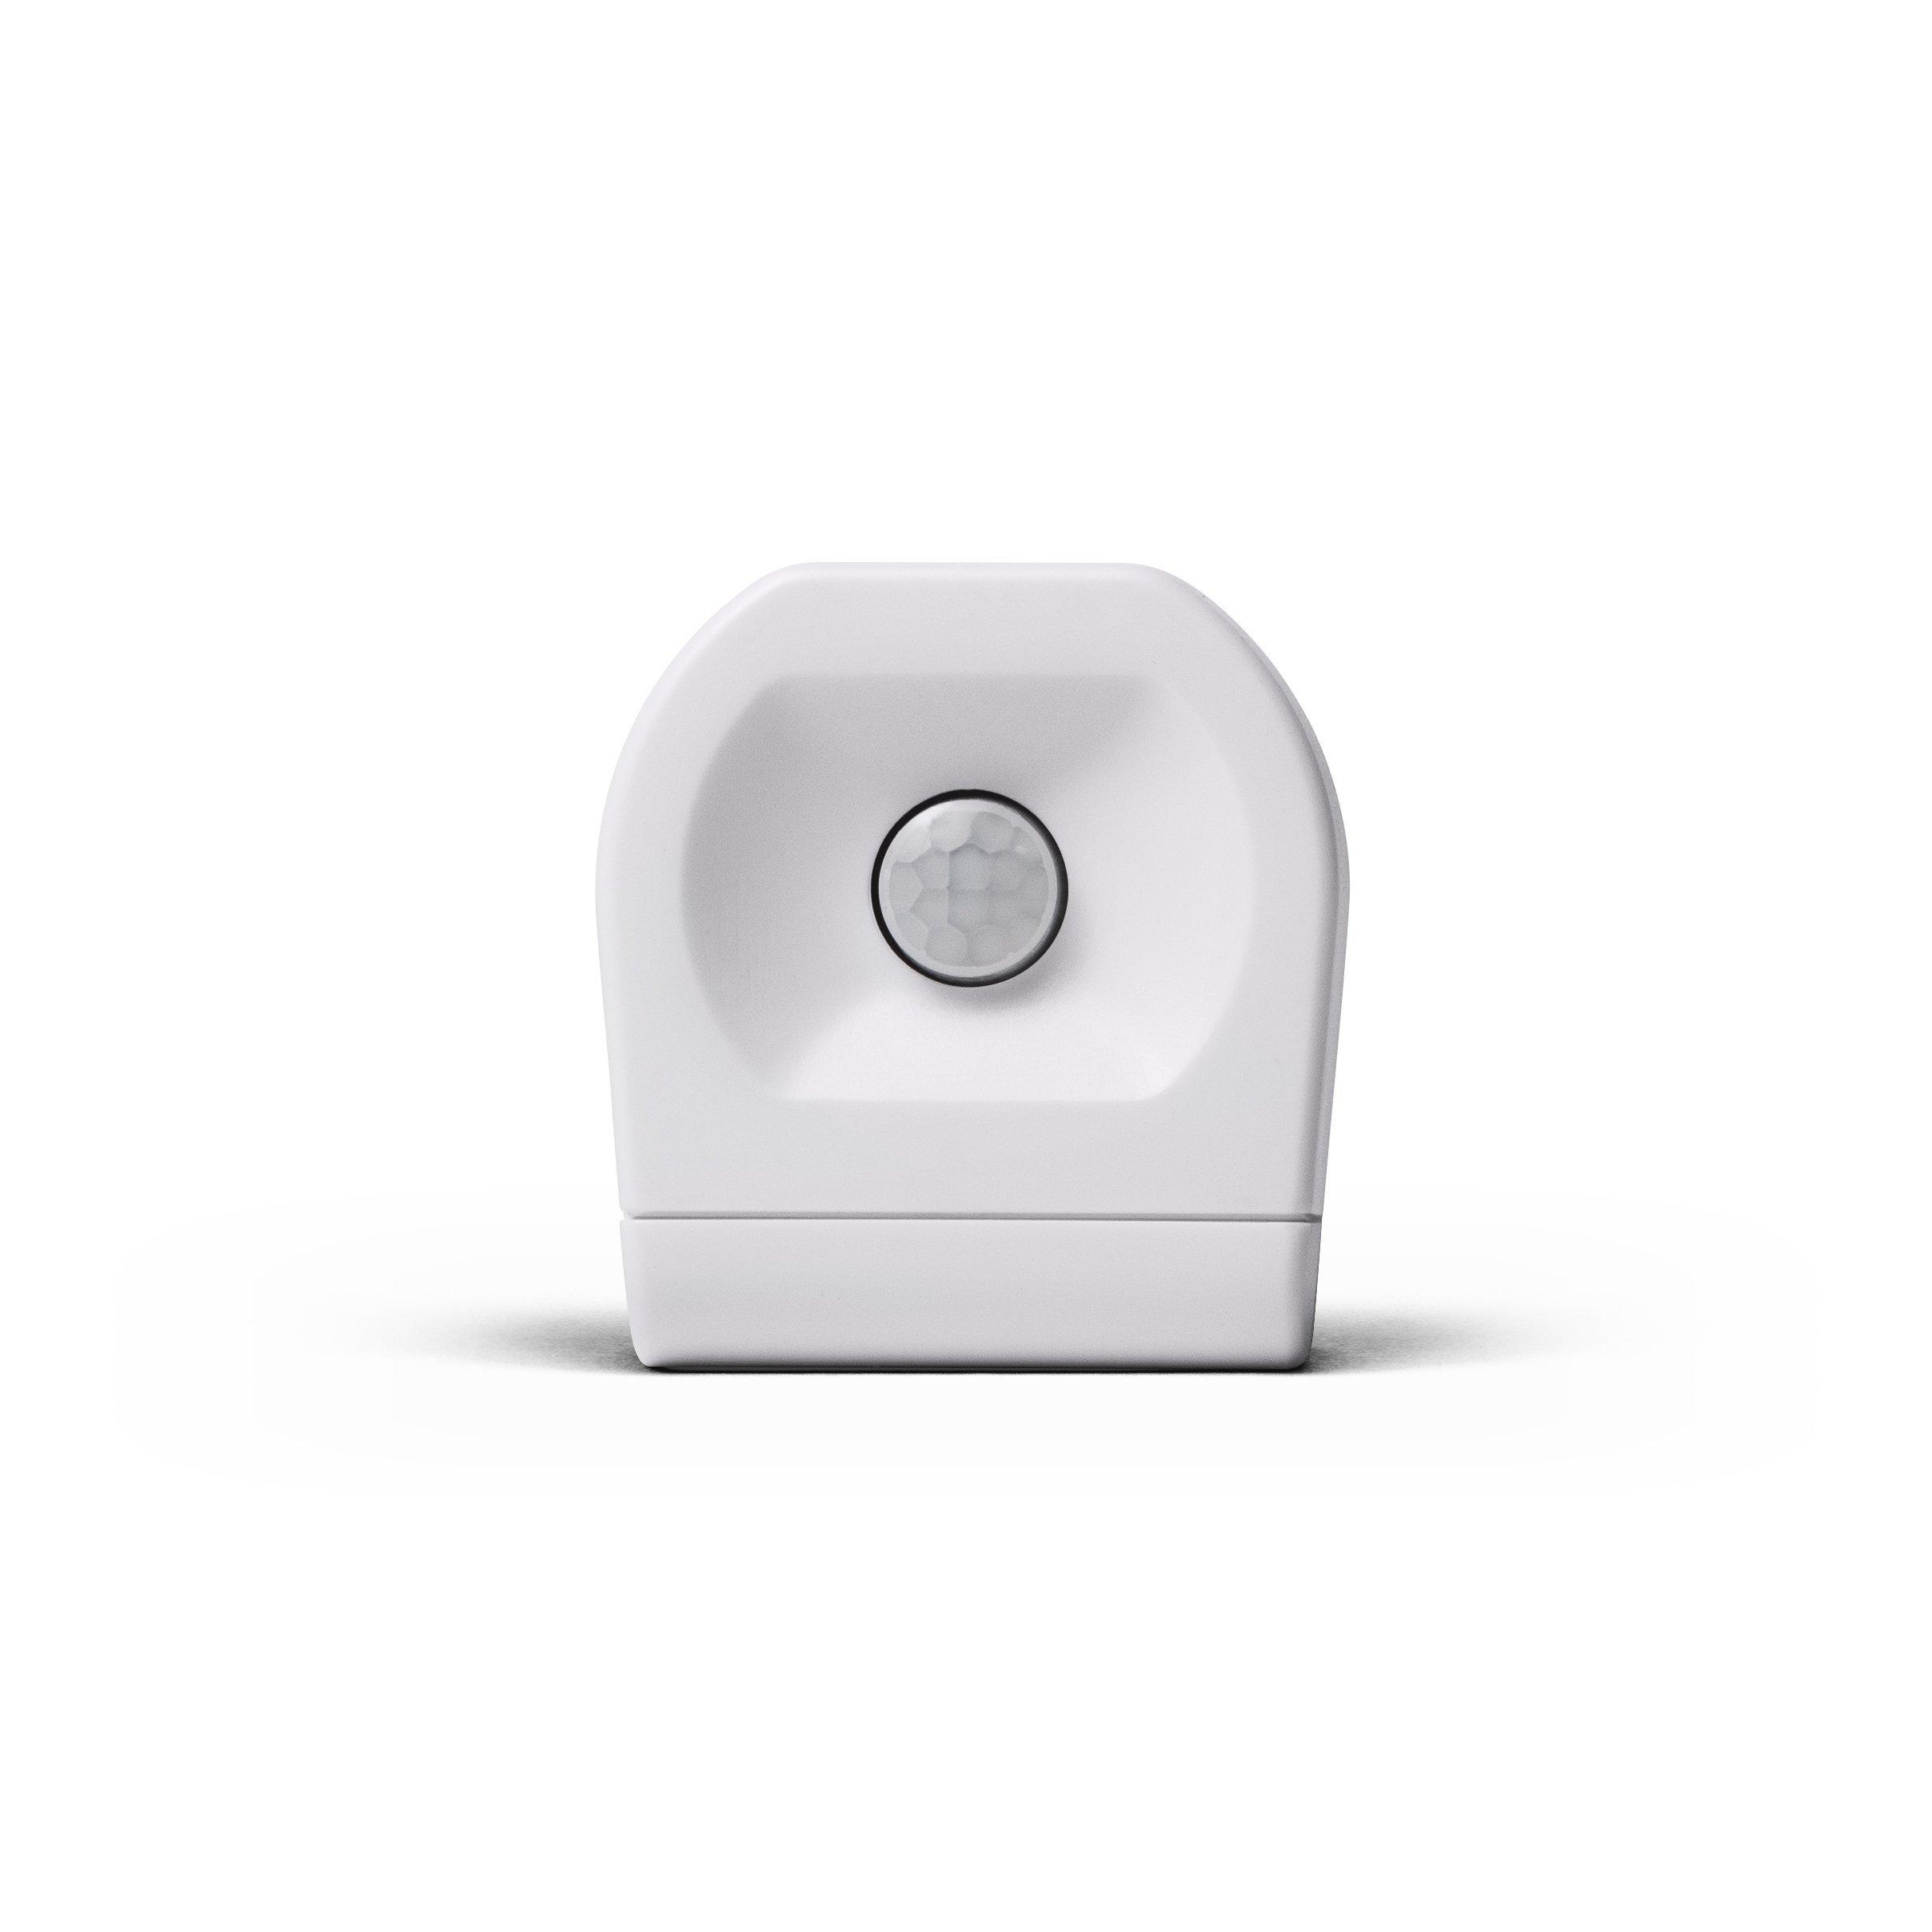 Iris Motion Sensor